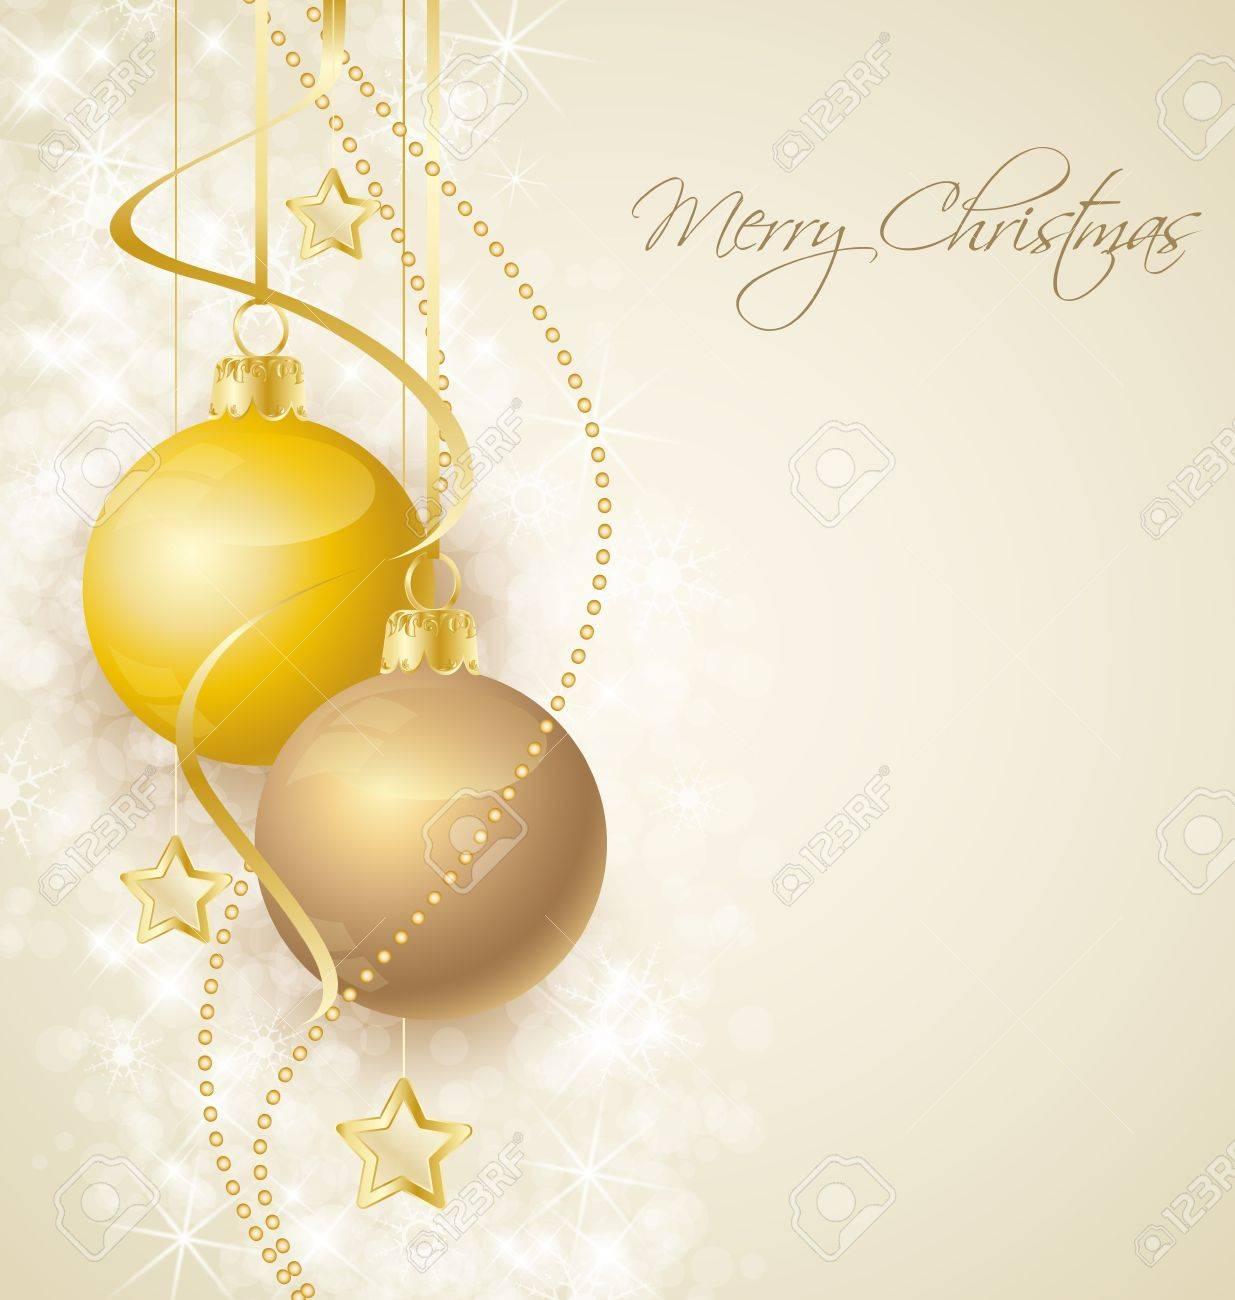 Christmas background with stars and Christmas balls Stock Vector - 15538437